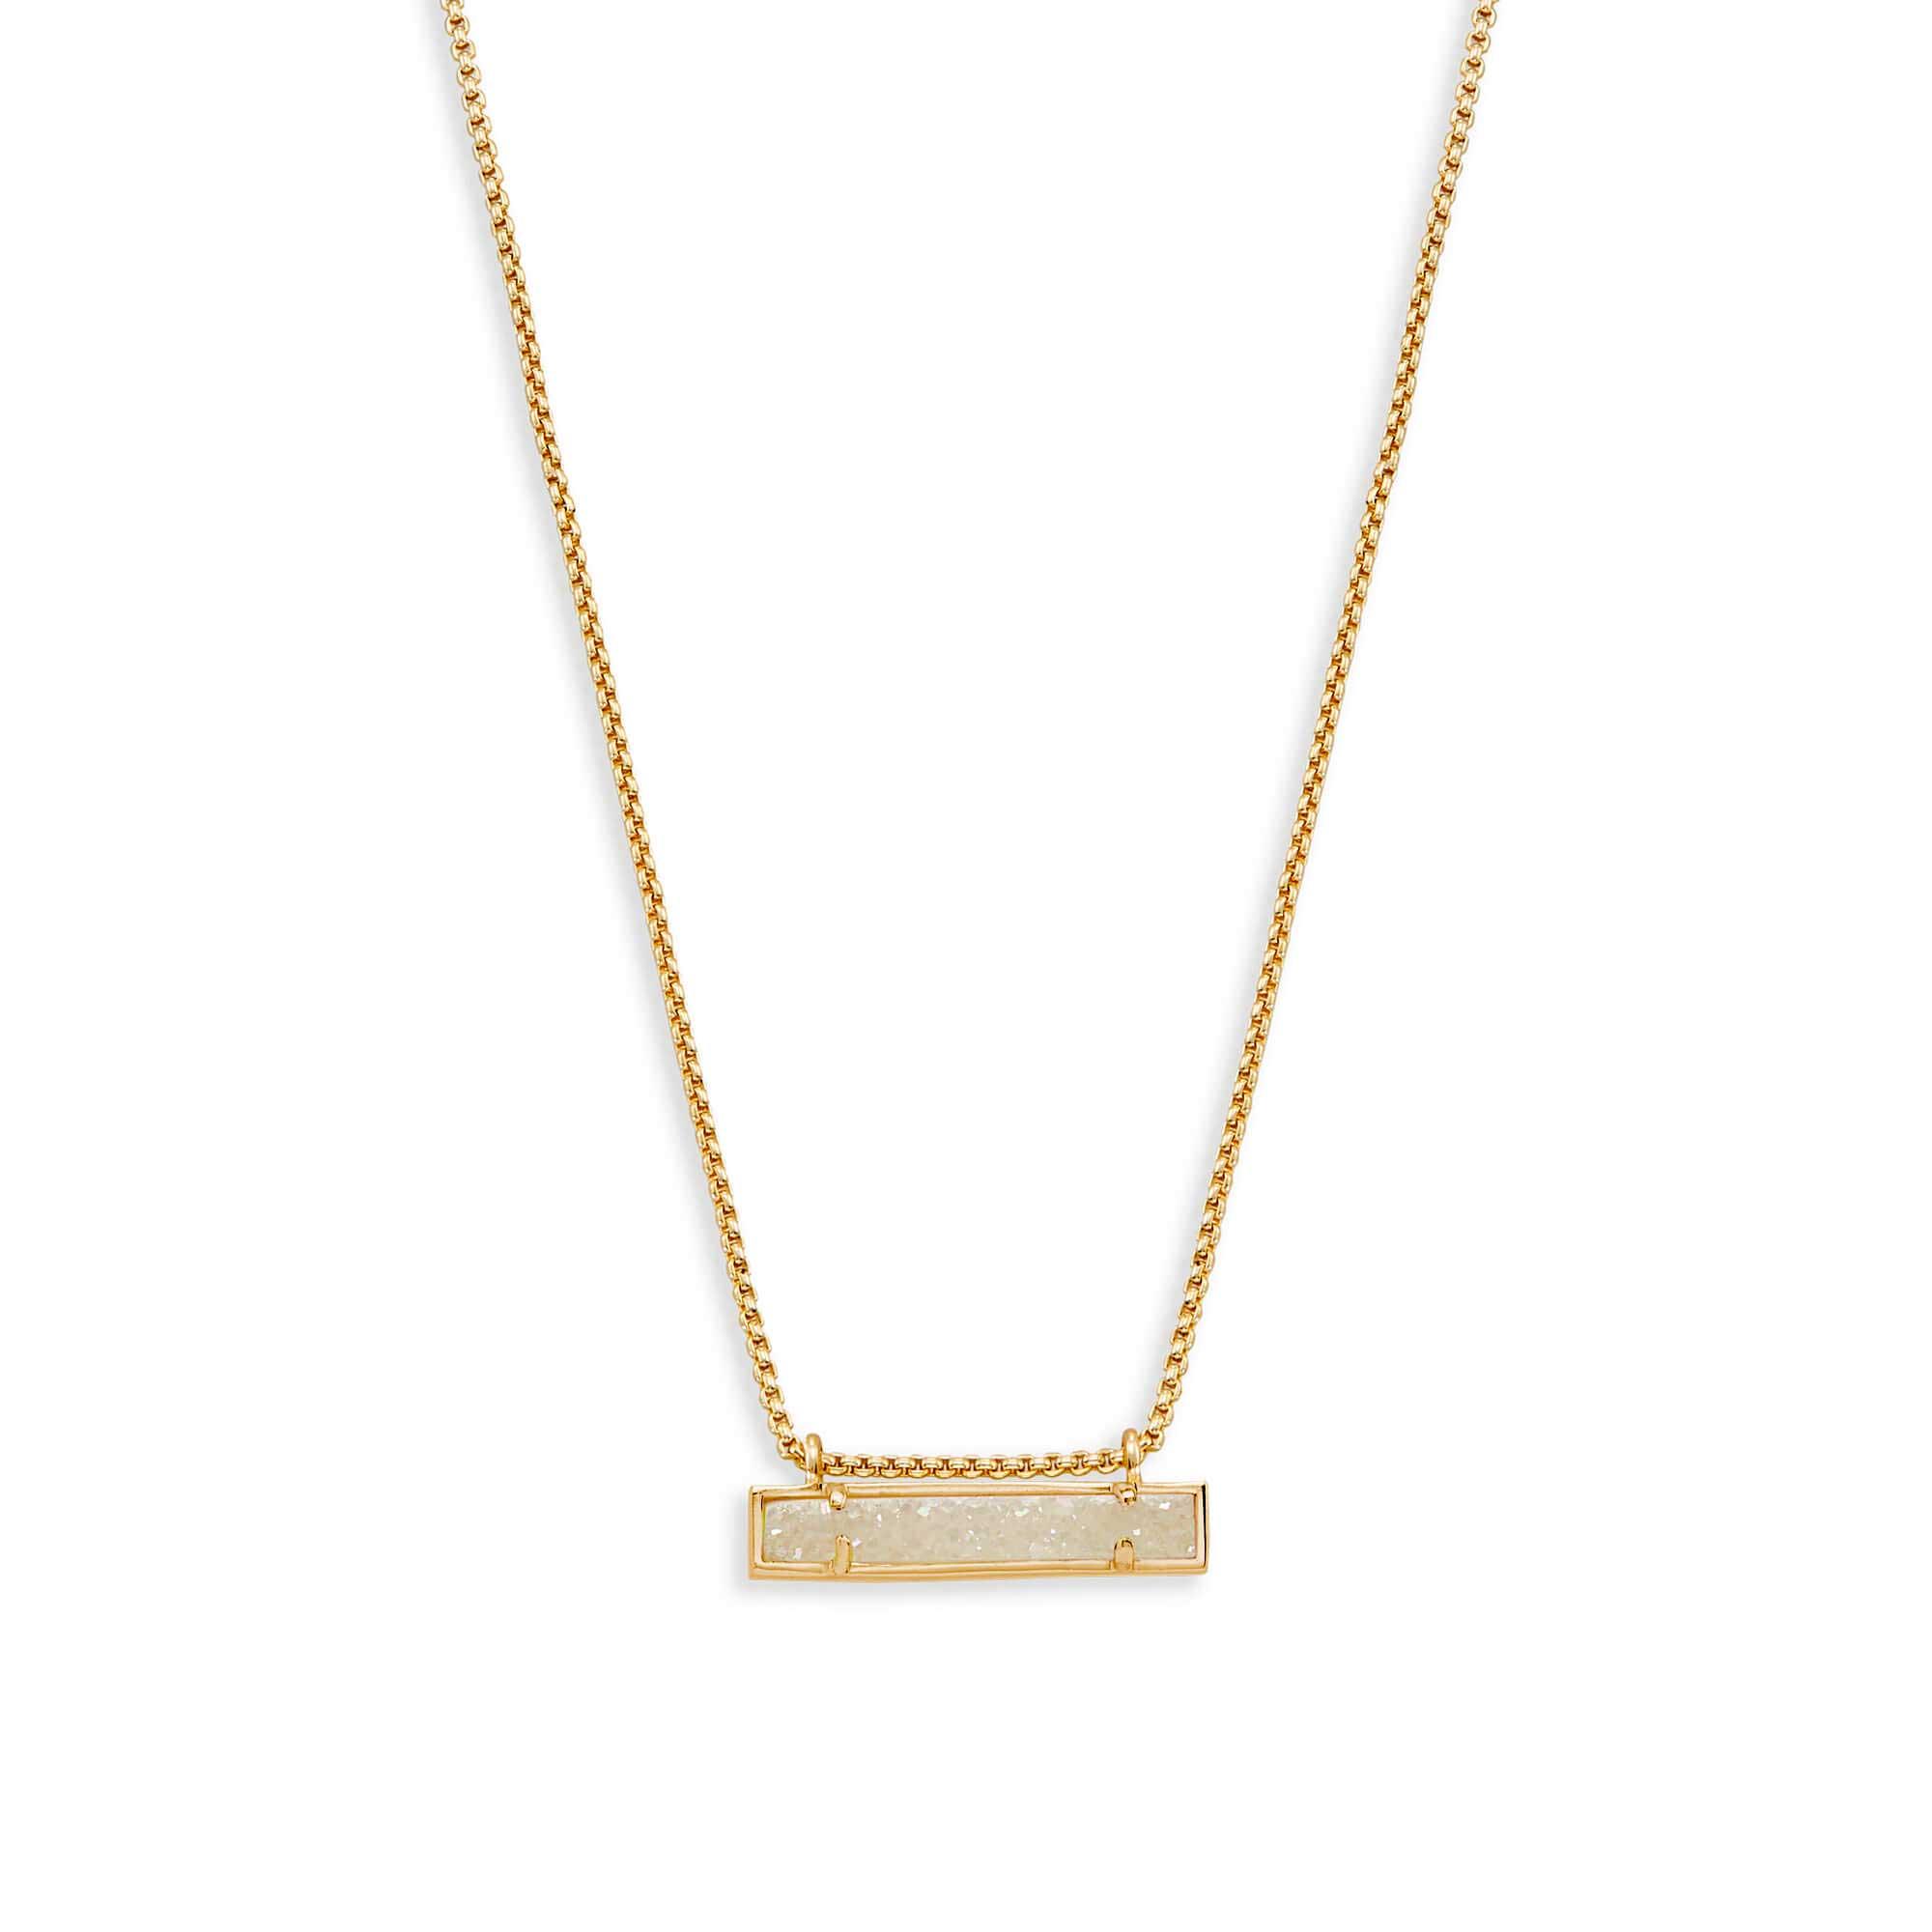 Kendra Scott Leanor Bar Pendant Necklace In Iridescent